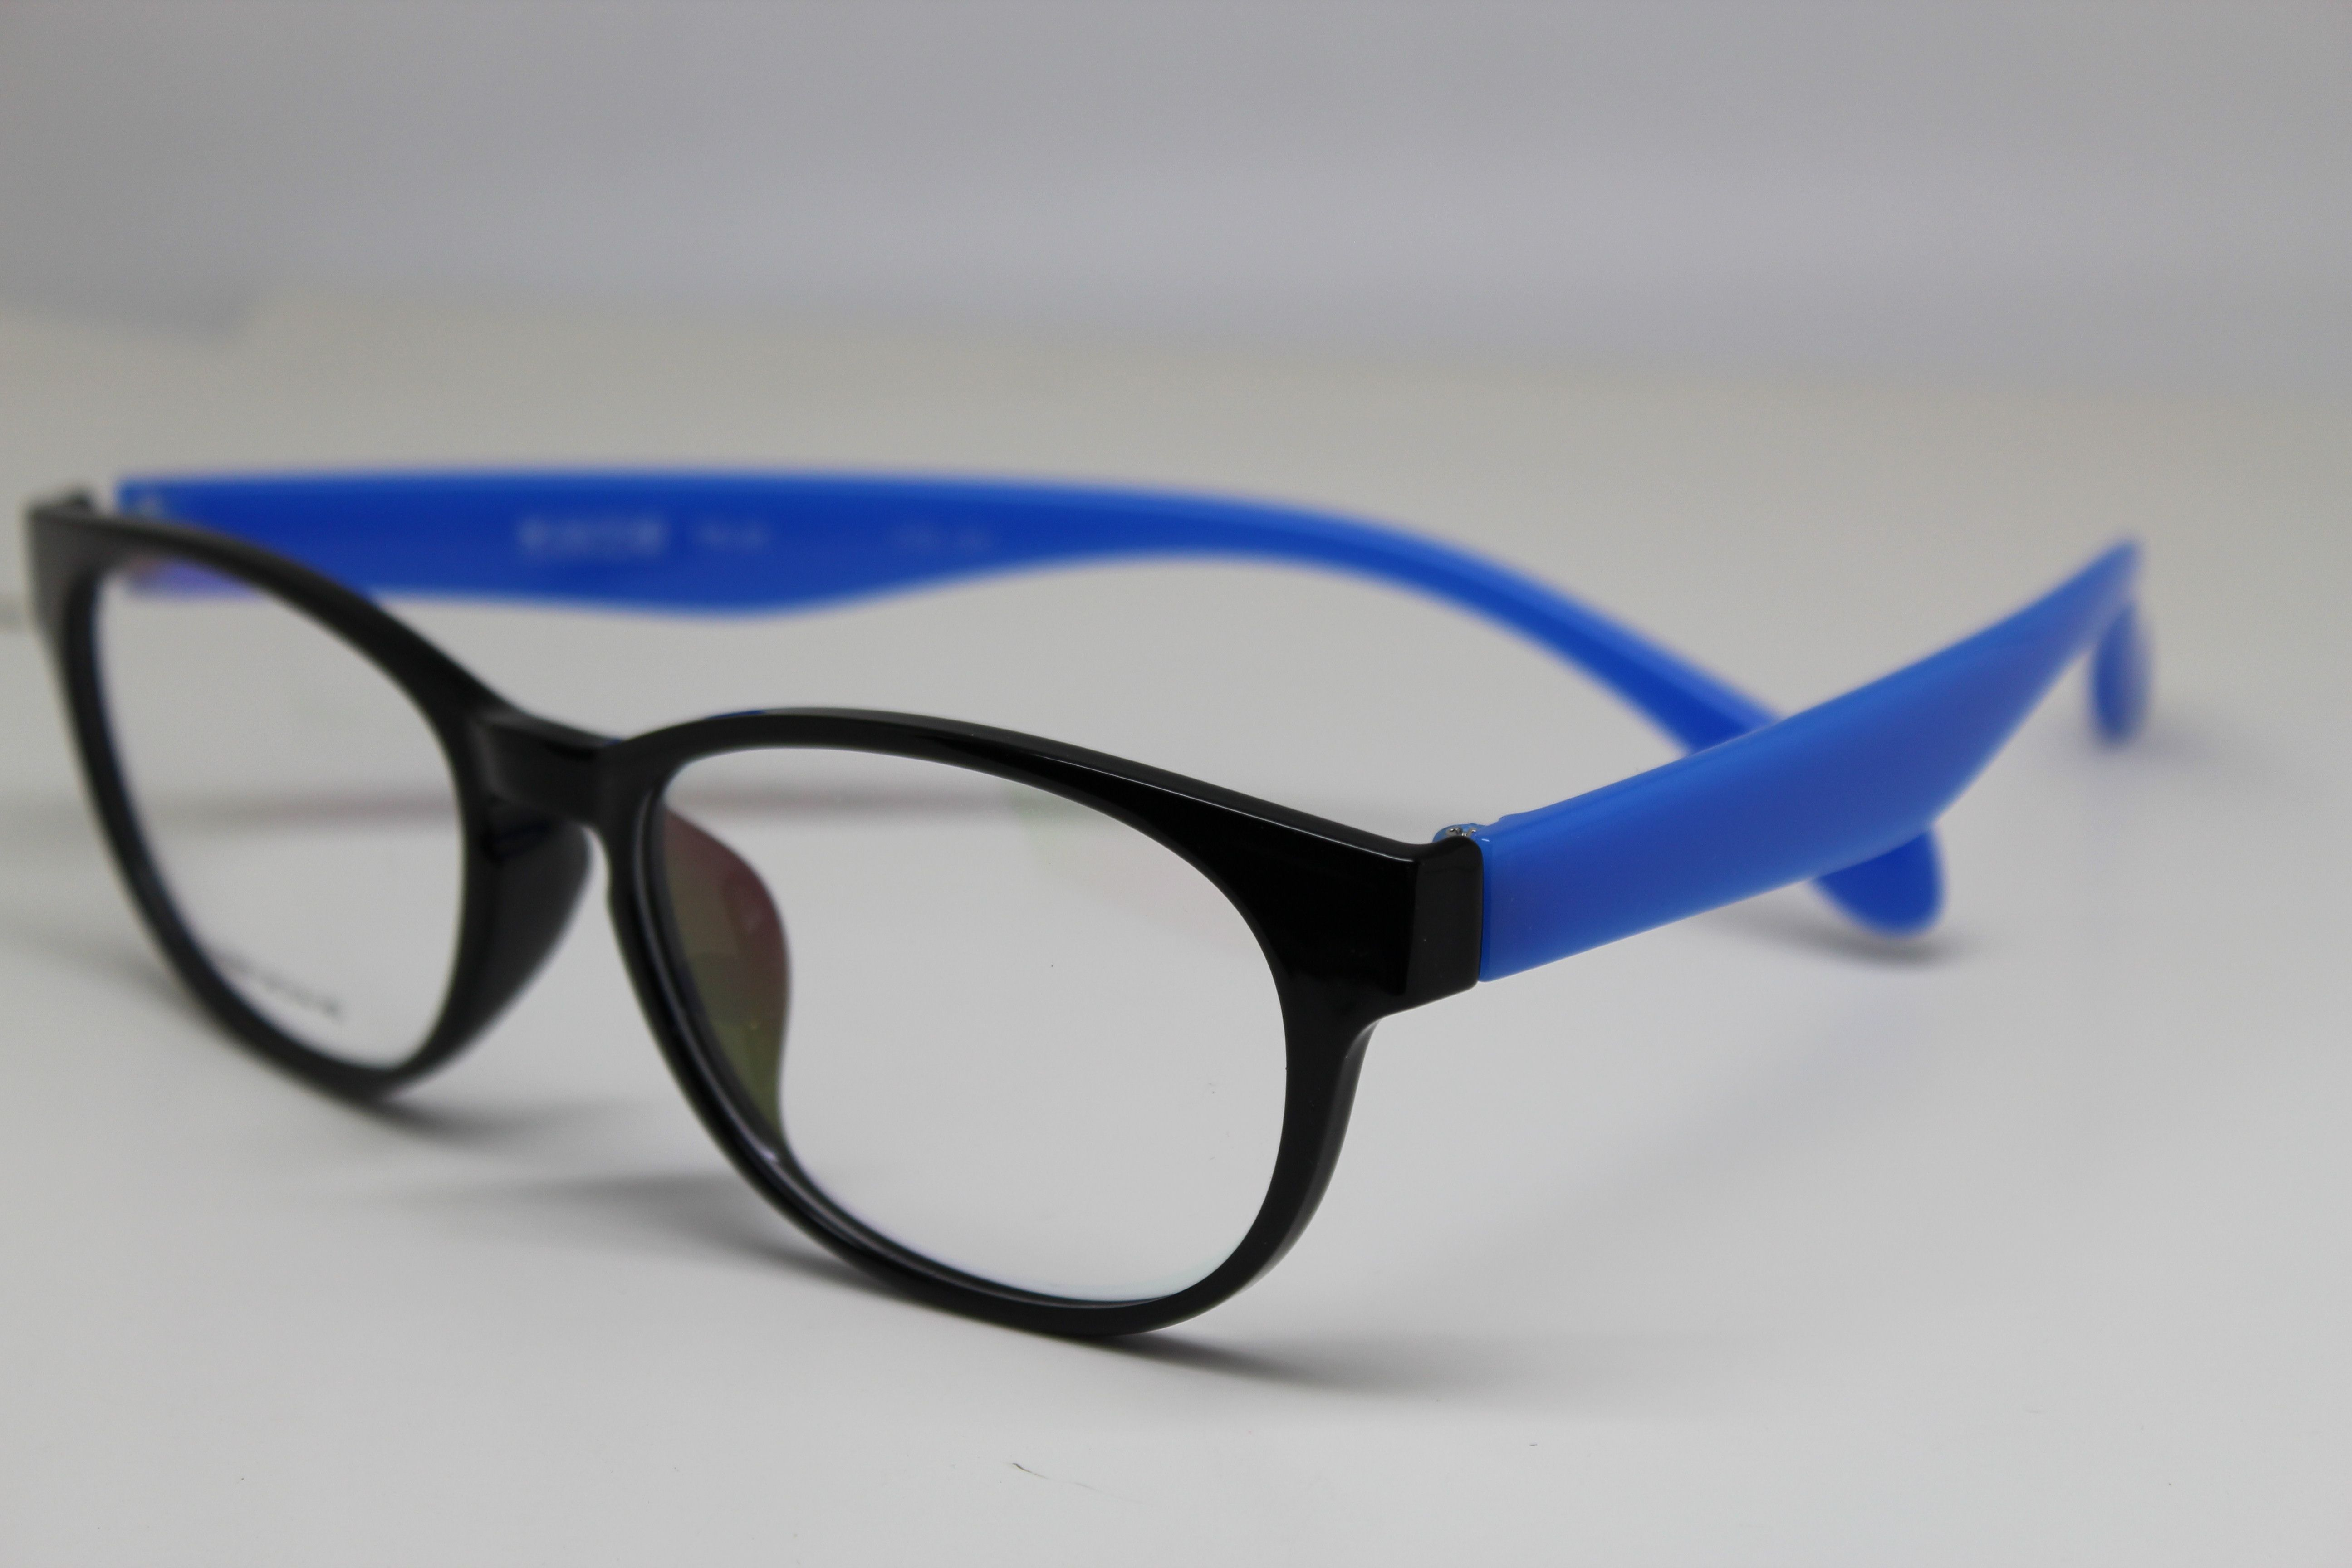 shiny blk & blue temples tr90 memory flex eyeglasses wear